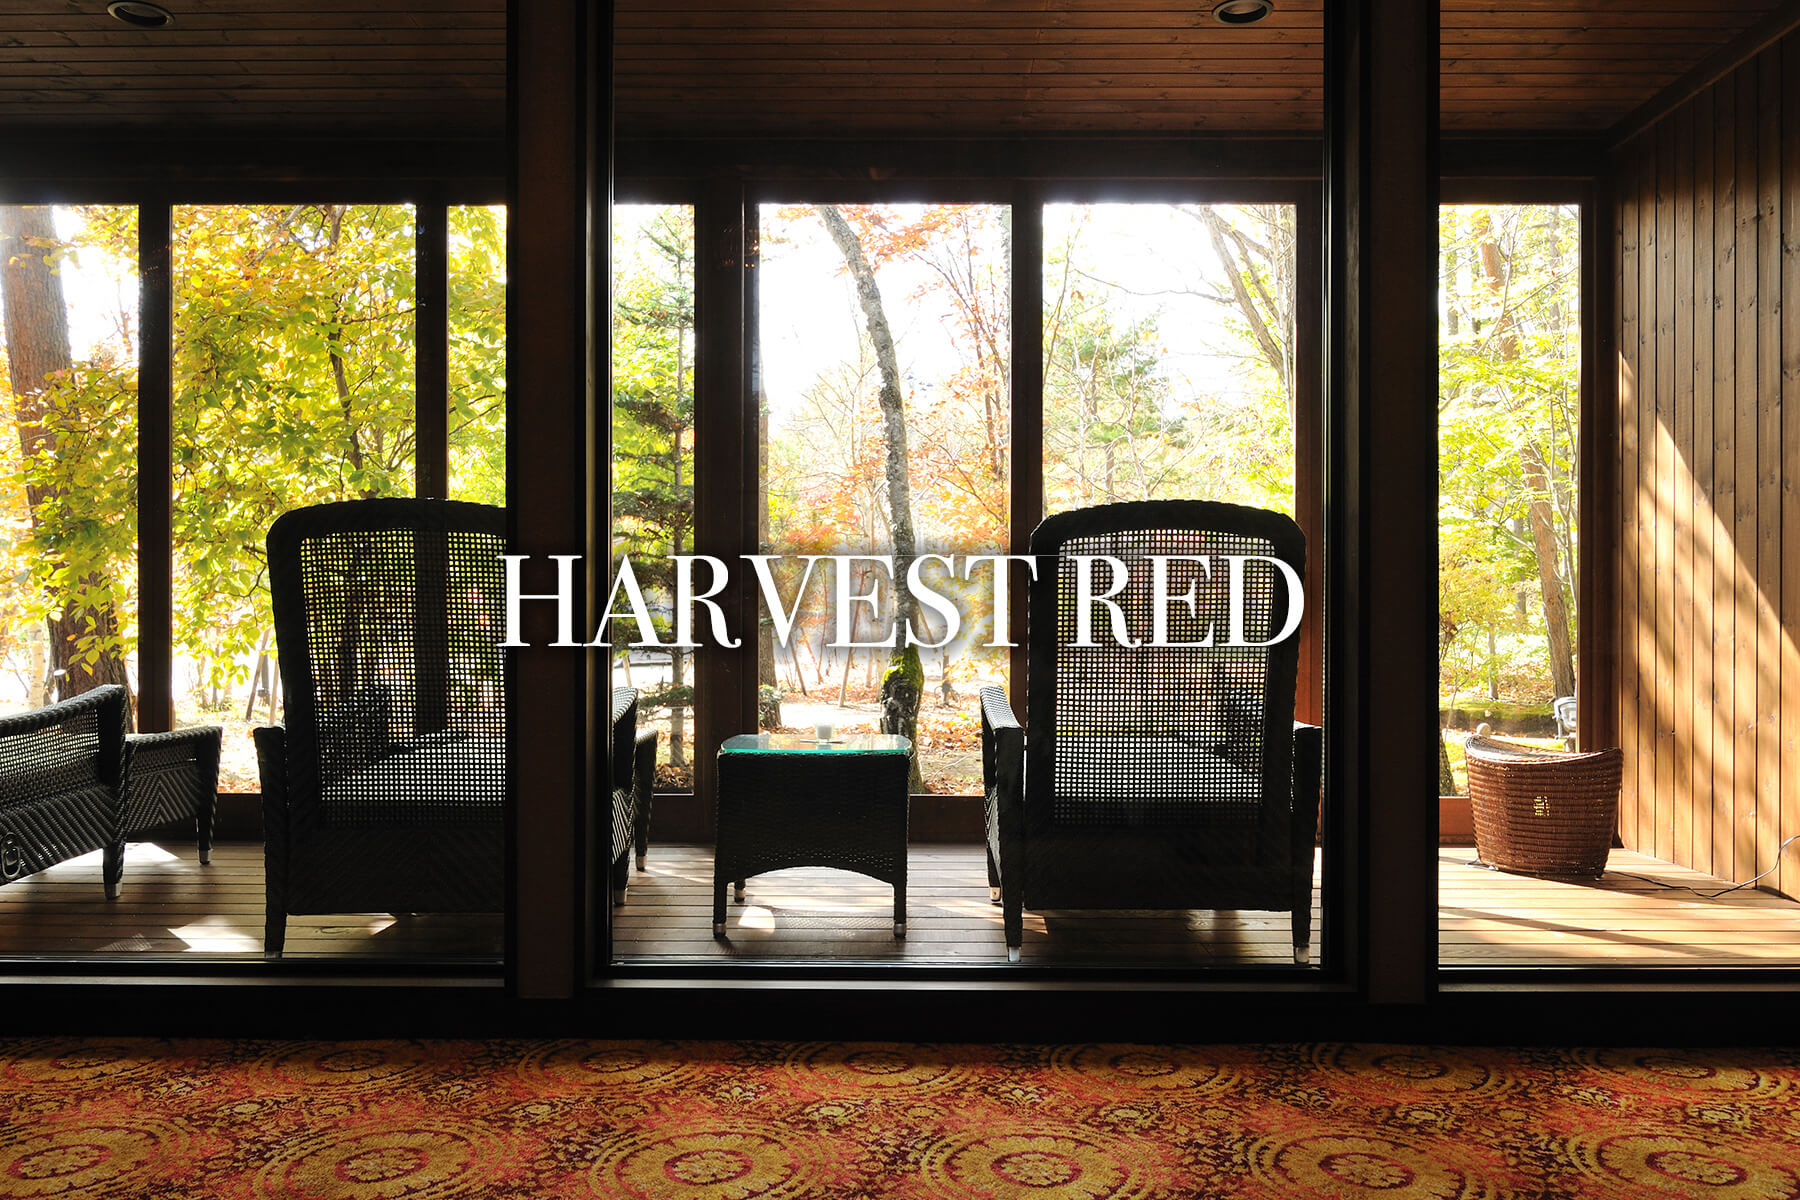 HARVEST RED